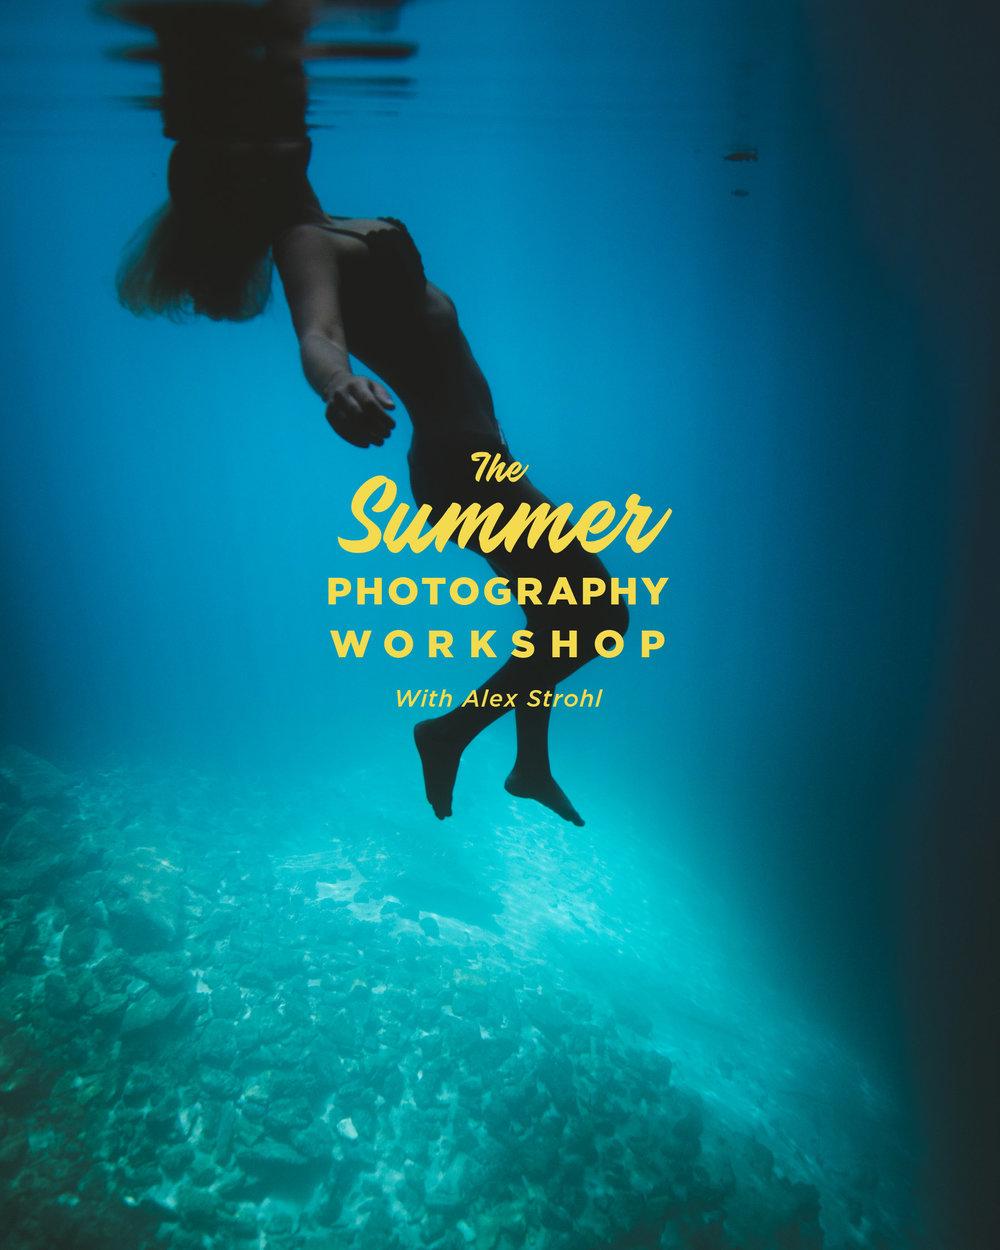 - The Summer Photo WorkshopReleased: 2018 90 Min / 9 Episodes / 2 Presets